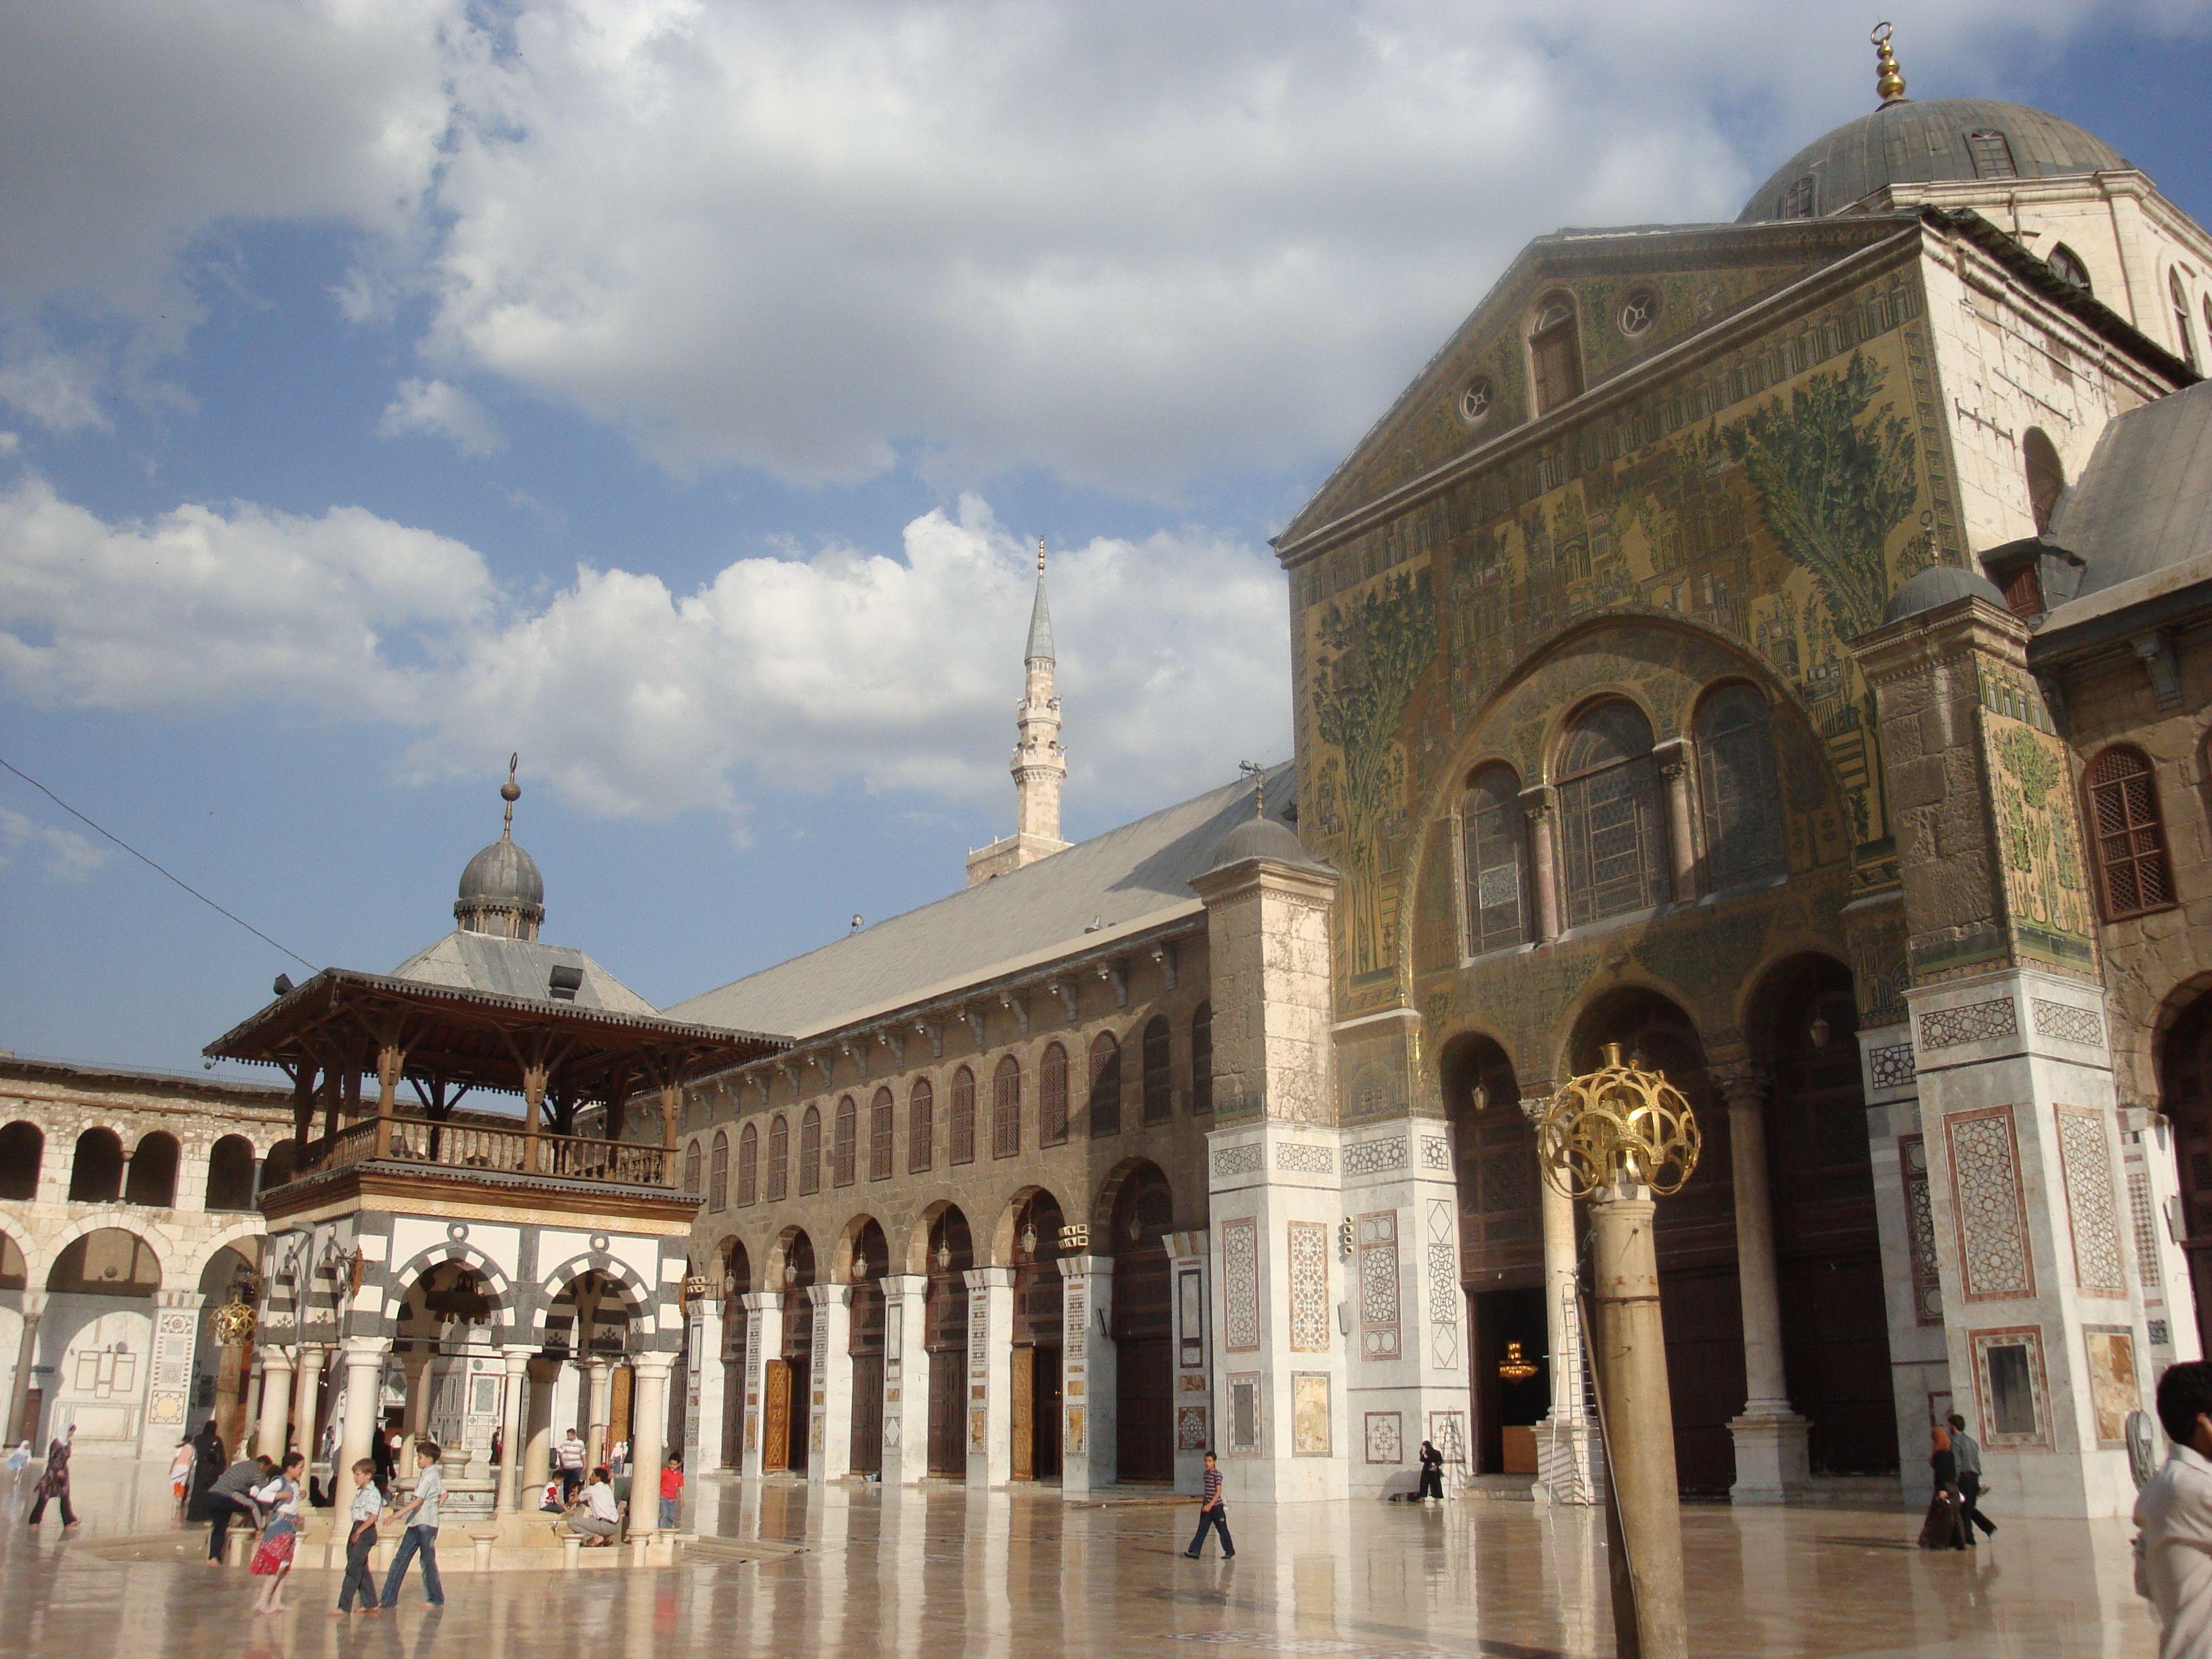 Umayyad Mosque, Damascus, Syria (Photo Credit: Michael-Ann